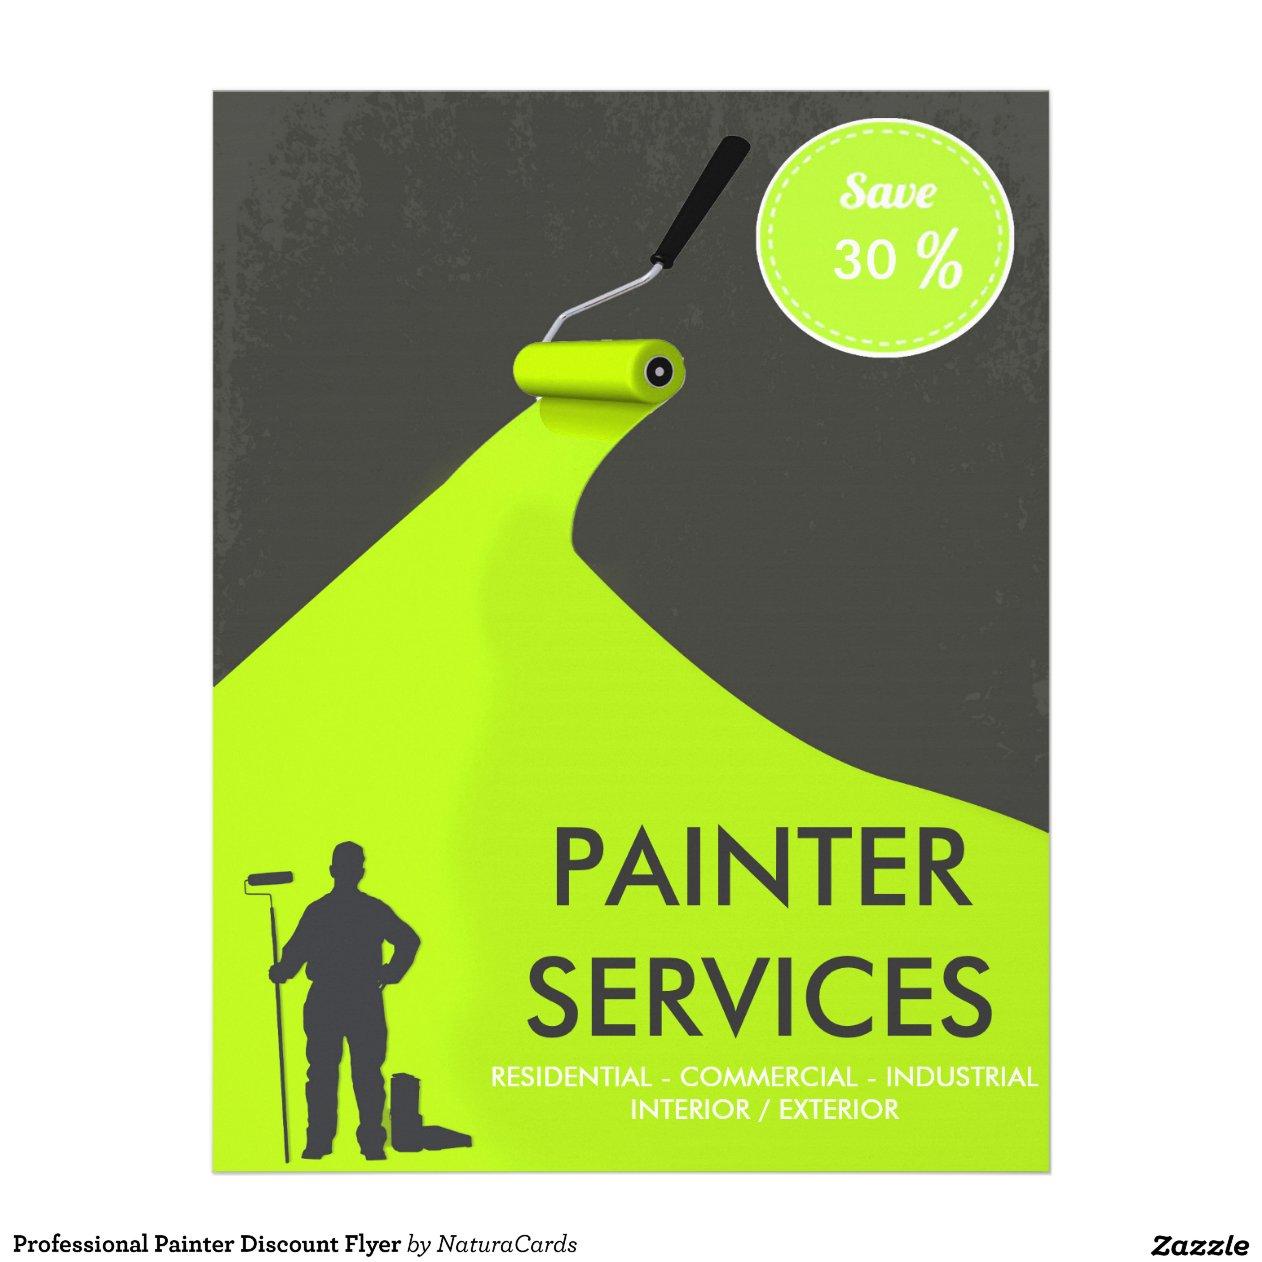 image regarding Benjamin Moore Printable Coupon known as Have on painter coupon / B-tan substantial rapids discount coupons